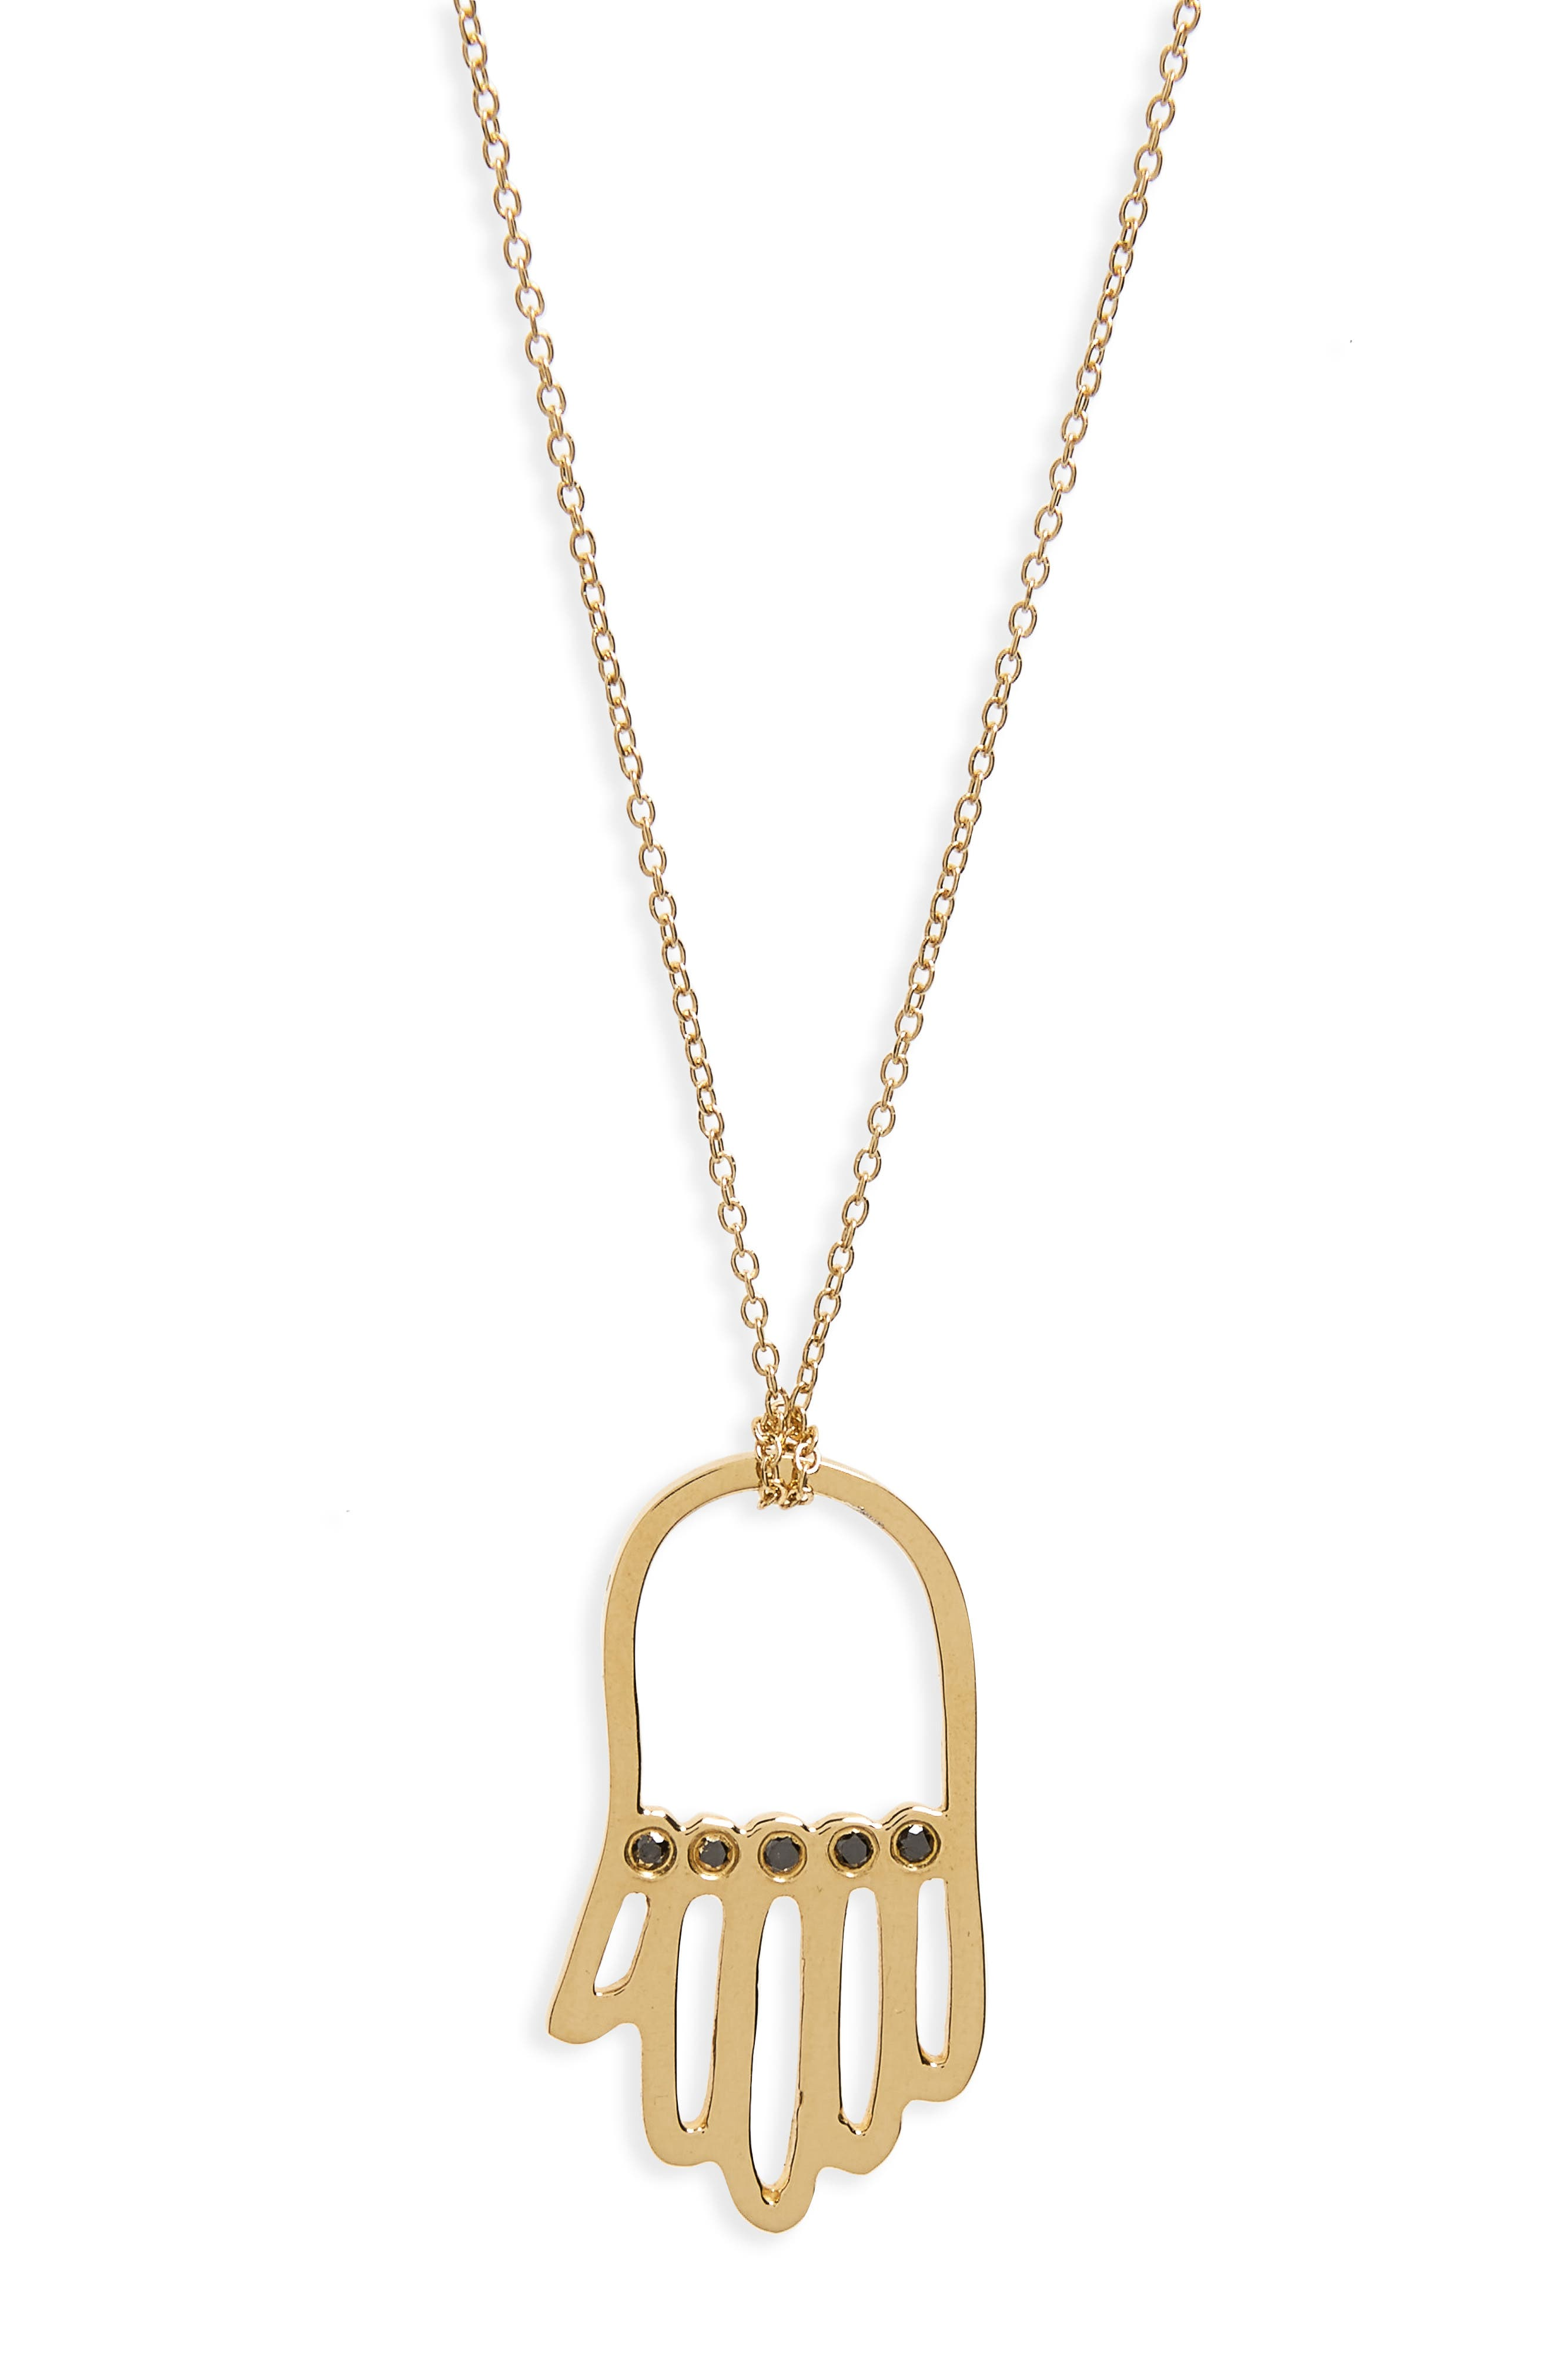 x Rashida Jones Black Diamond Hamsa Pendant Necklace,                         Main,                         color, Yellow Gold